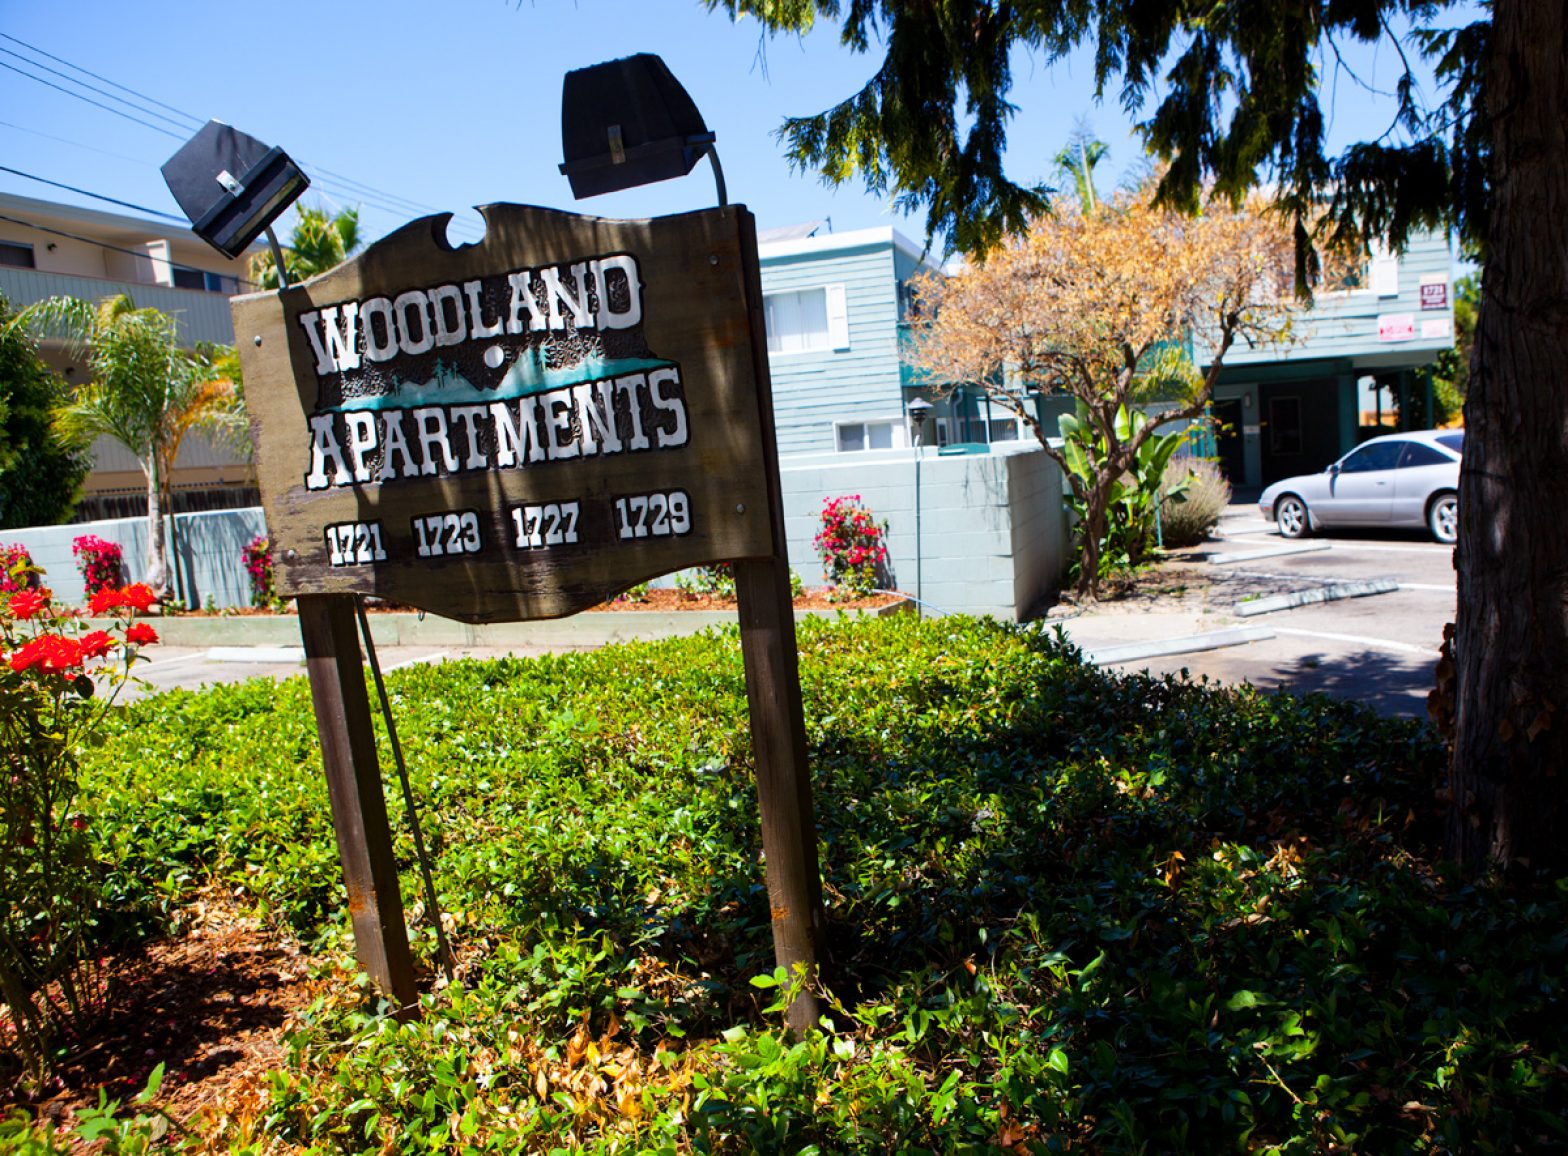 Woodland_Apartments_in_East_Palo_Alto._IAN_UMEDA.jpeg